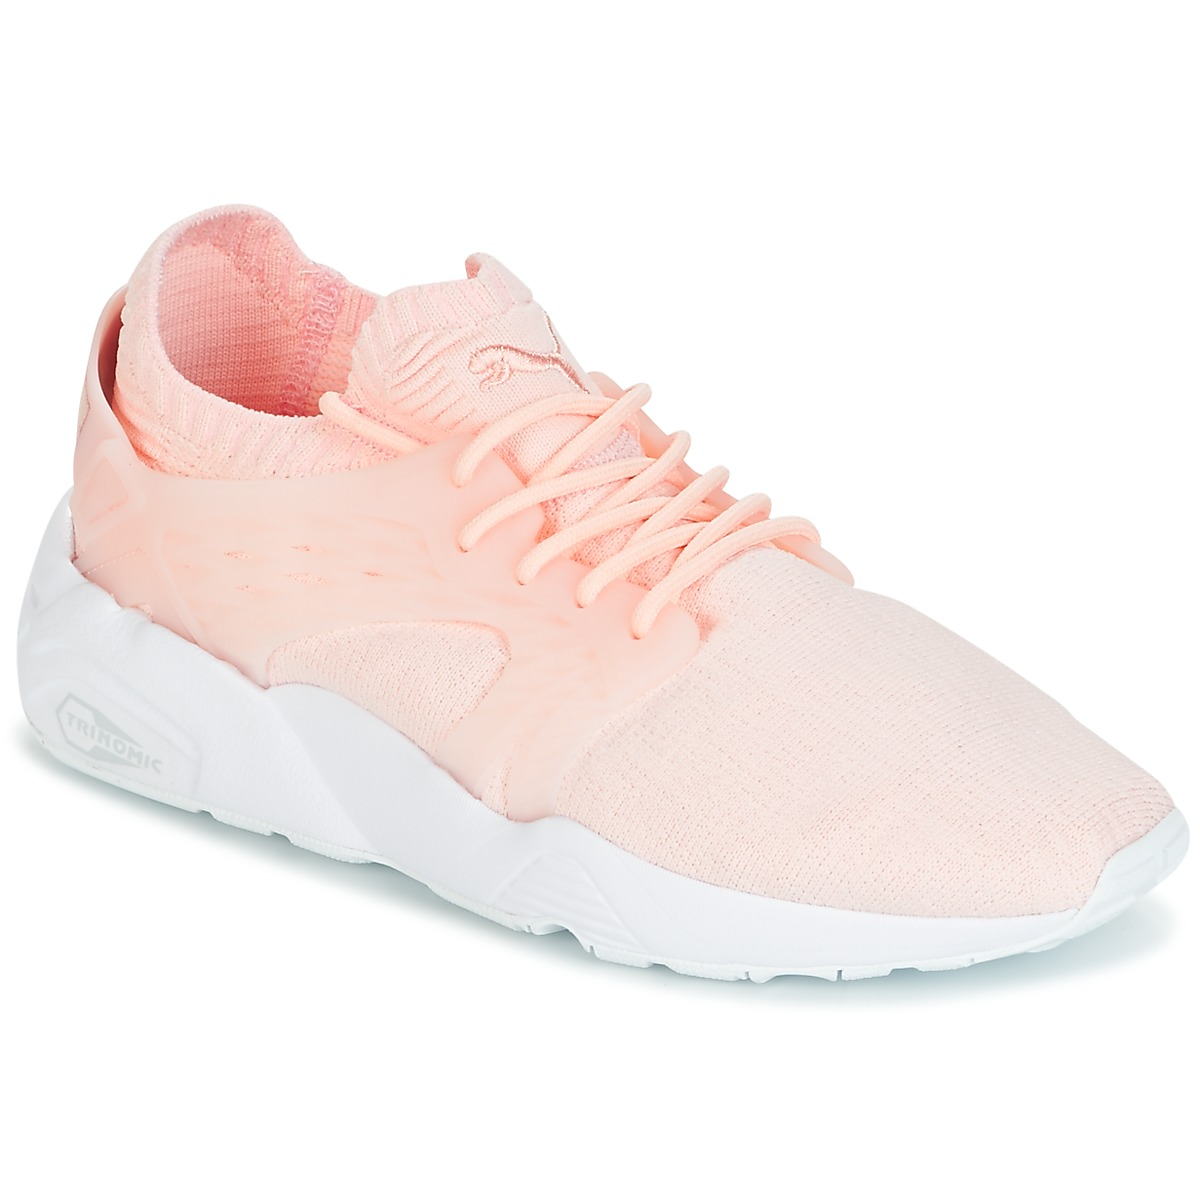 Puma Blaze Cage Knit Wn's Rose - Kostenloser Versand bei Spartoode ! - Schuhe Sneaker Low Damen 95,20 €